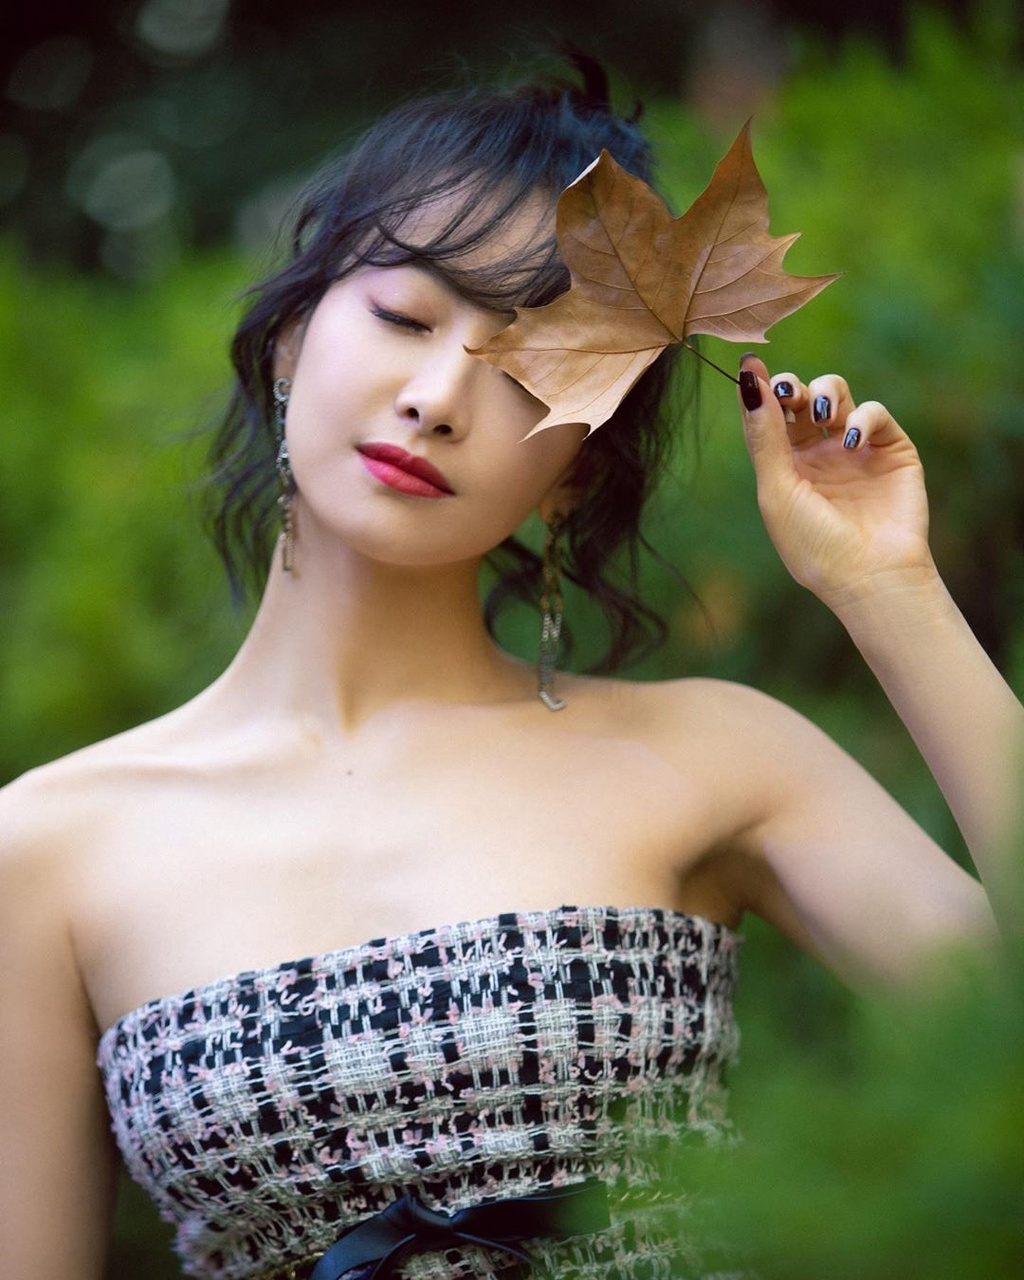 Ve goi cam o tuoi 33 cua Tong Thien 'Tram ke tiep la hanh phuc' hinh anh 5 79030136_2315608252063703_4297733000526278584_n.jpg